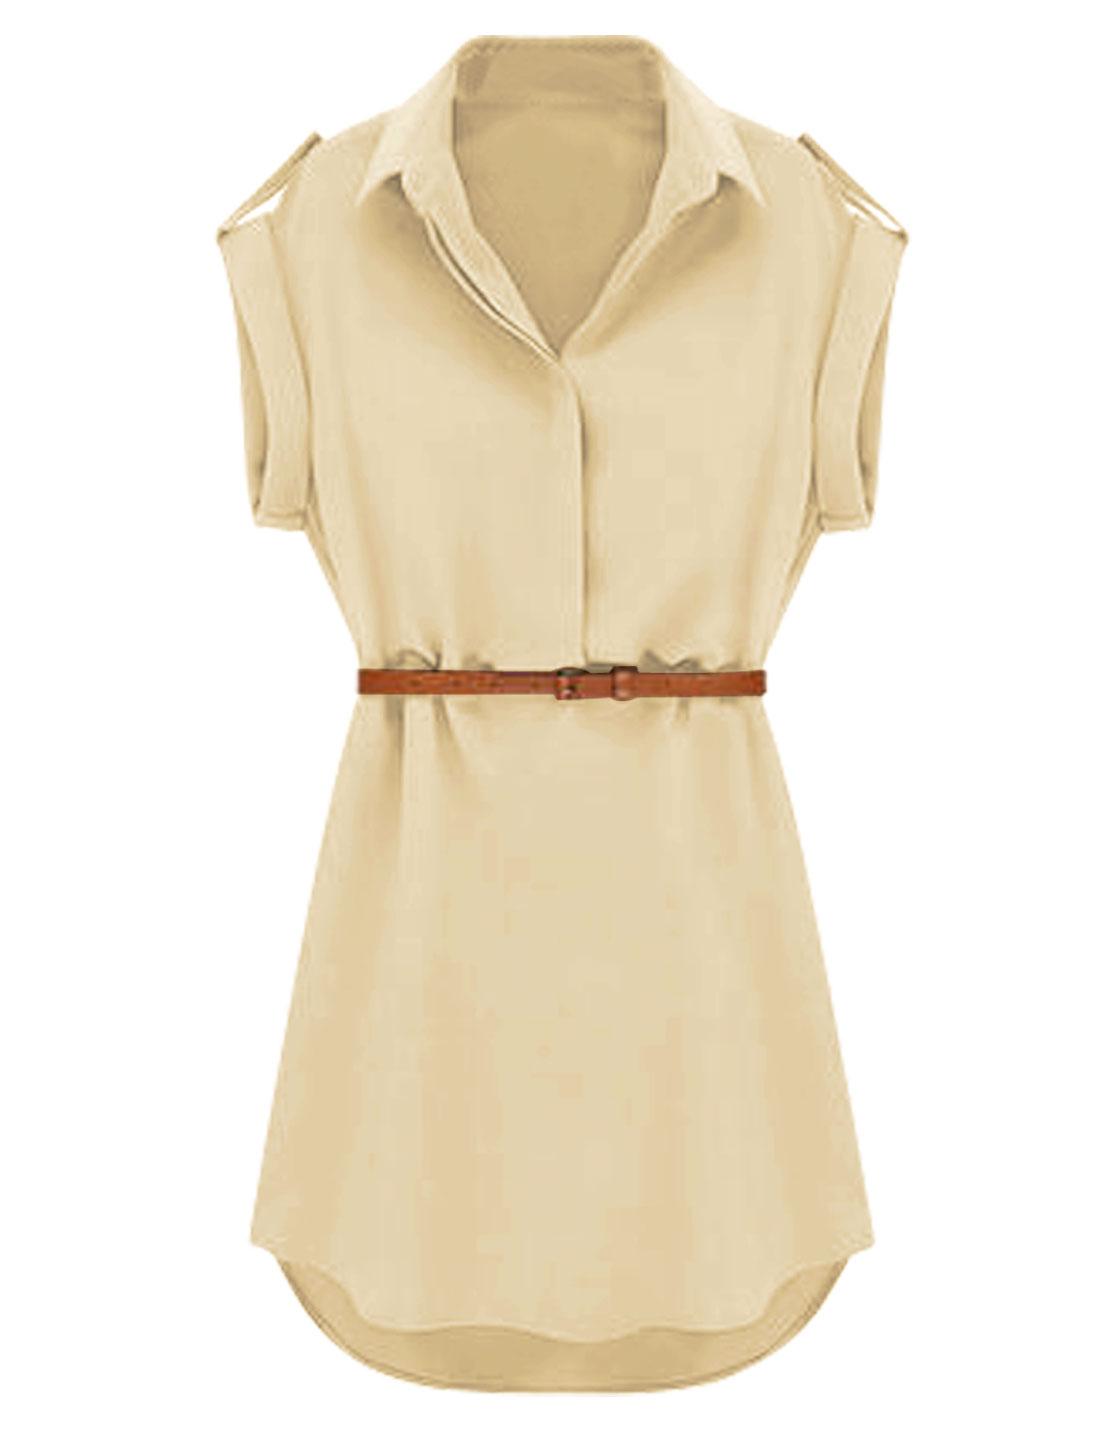 Lady Point Collar Round Hem 1/2 Placket Shirt Dress w Belt Khaki M